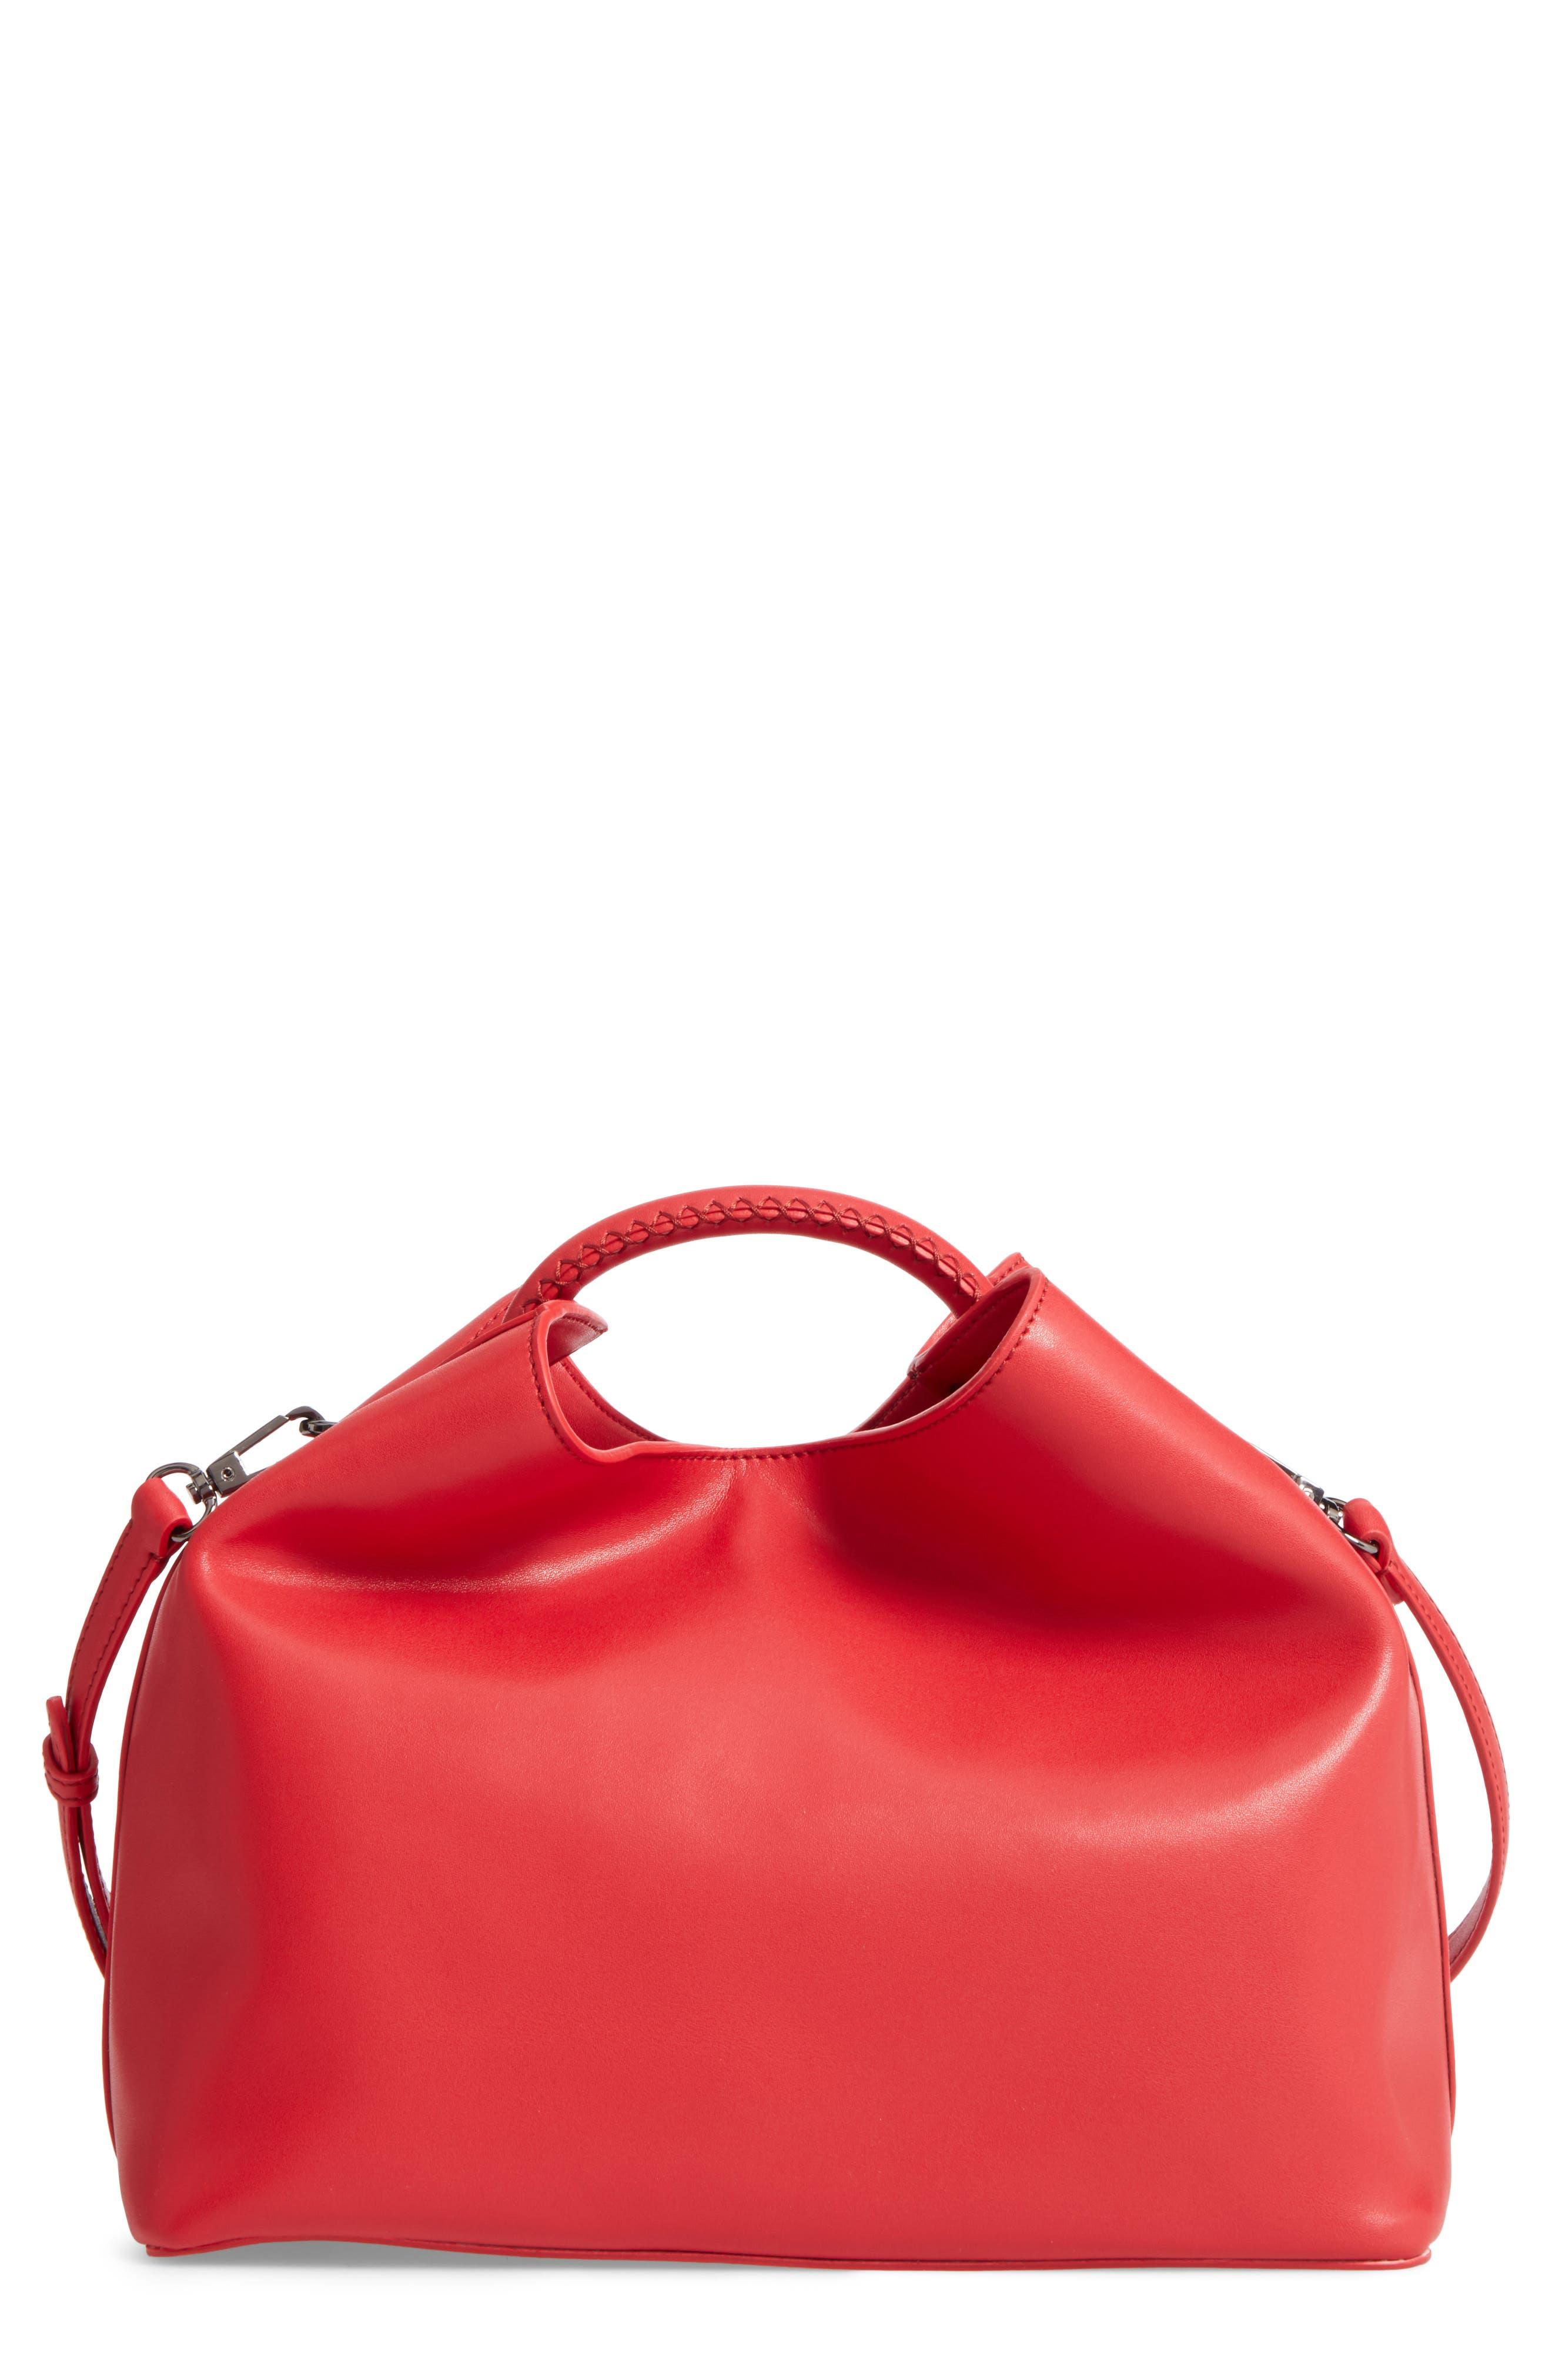 Main Image - Elleme Raisin Leather Handbag